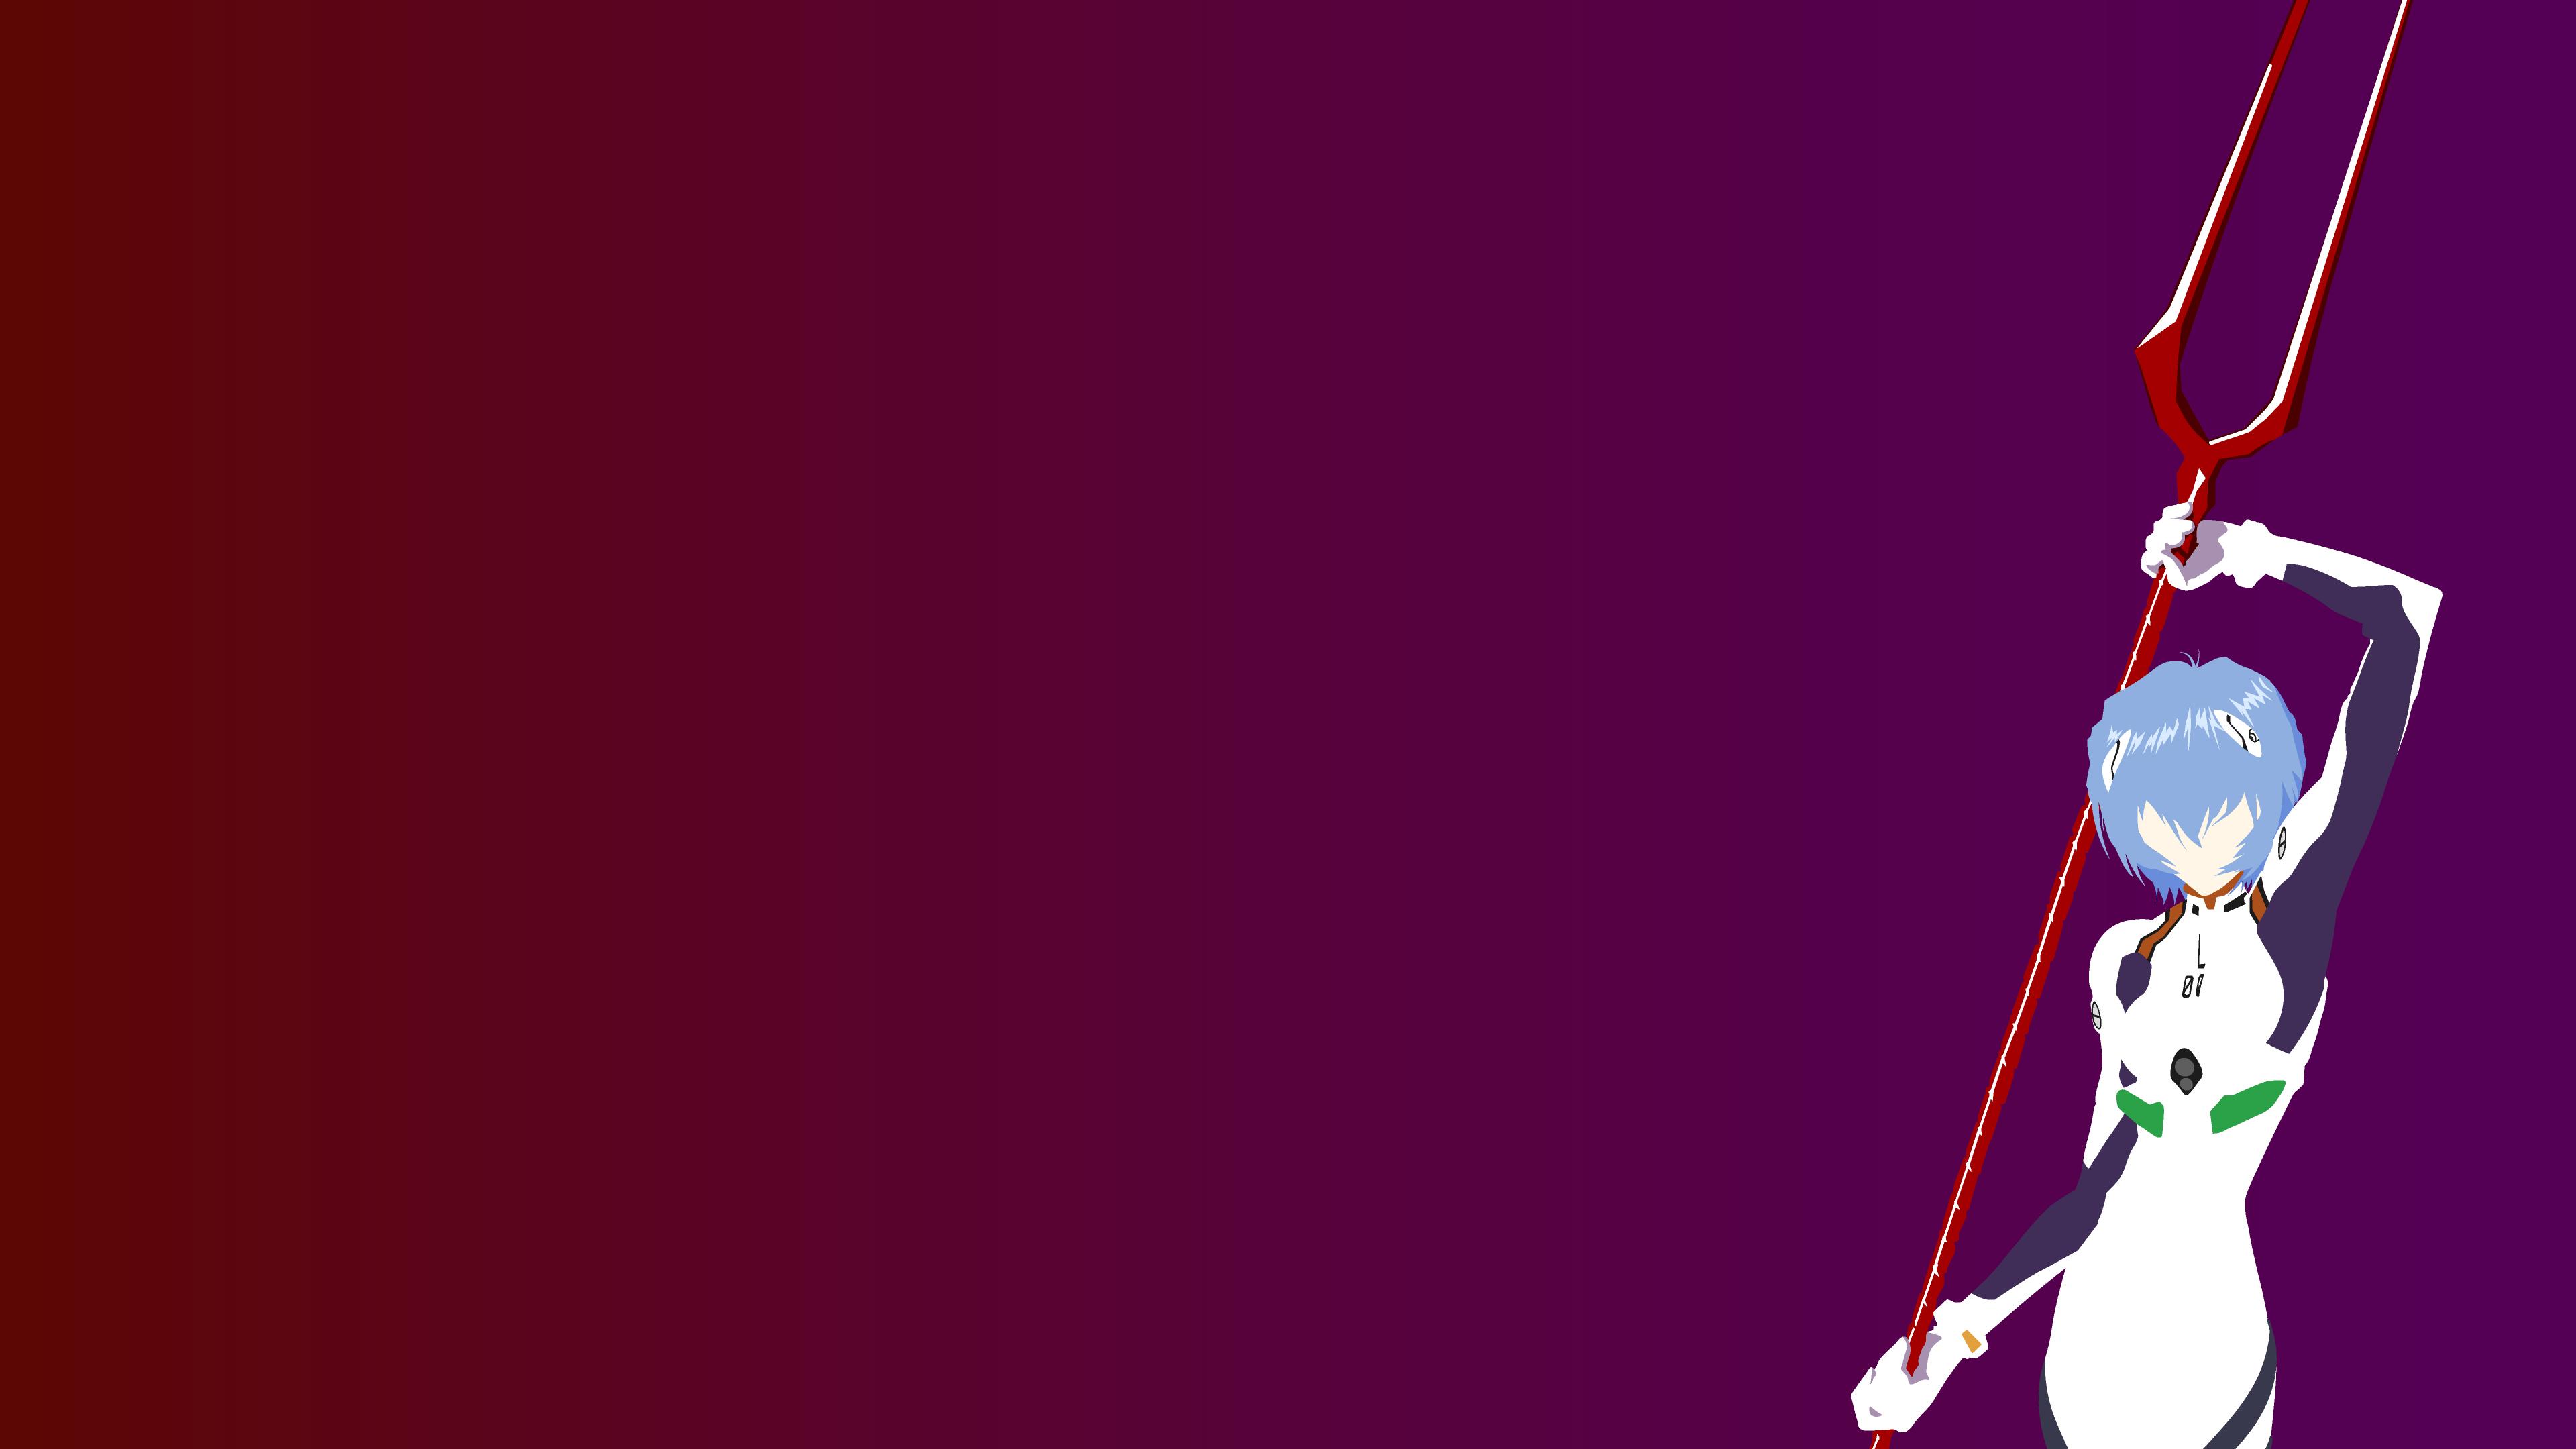 Neon Genesis Evangelion 4k Ultra Hd Wallpaper Background Image